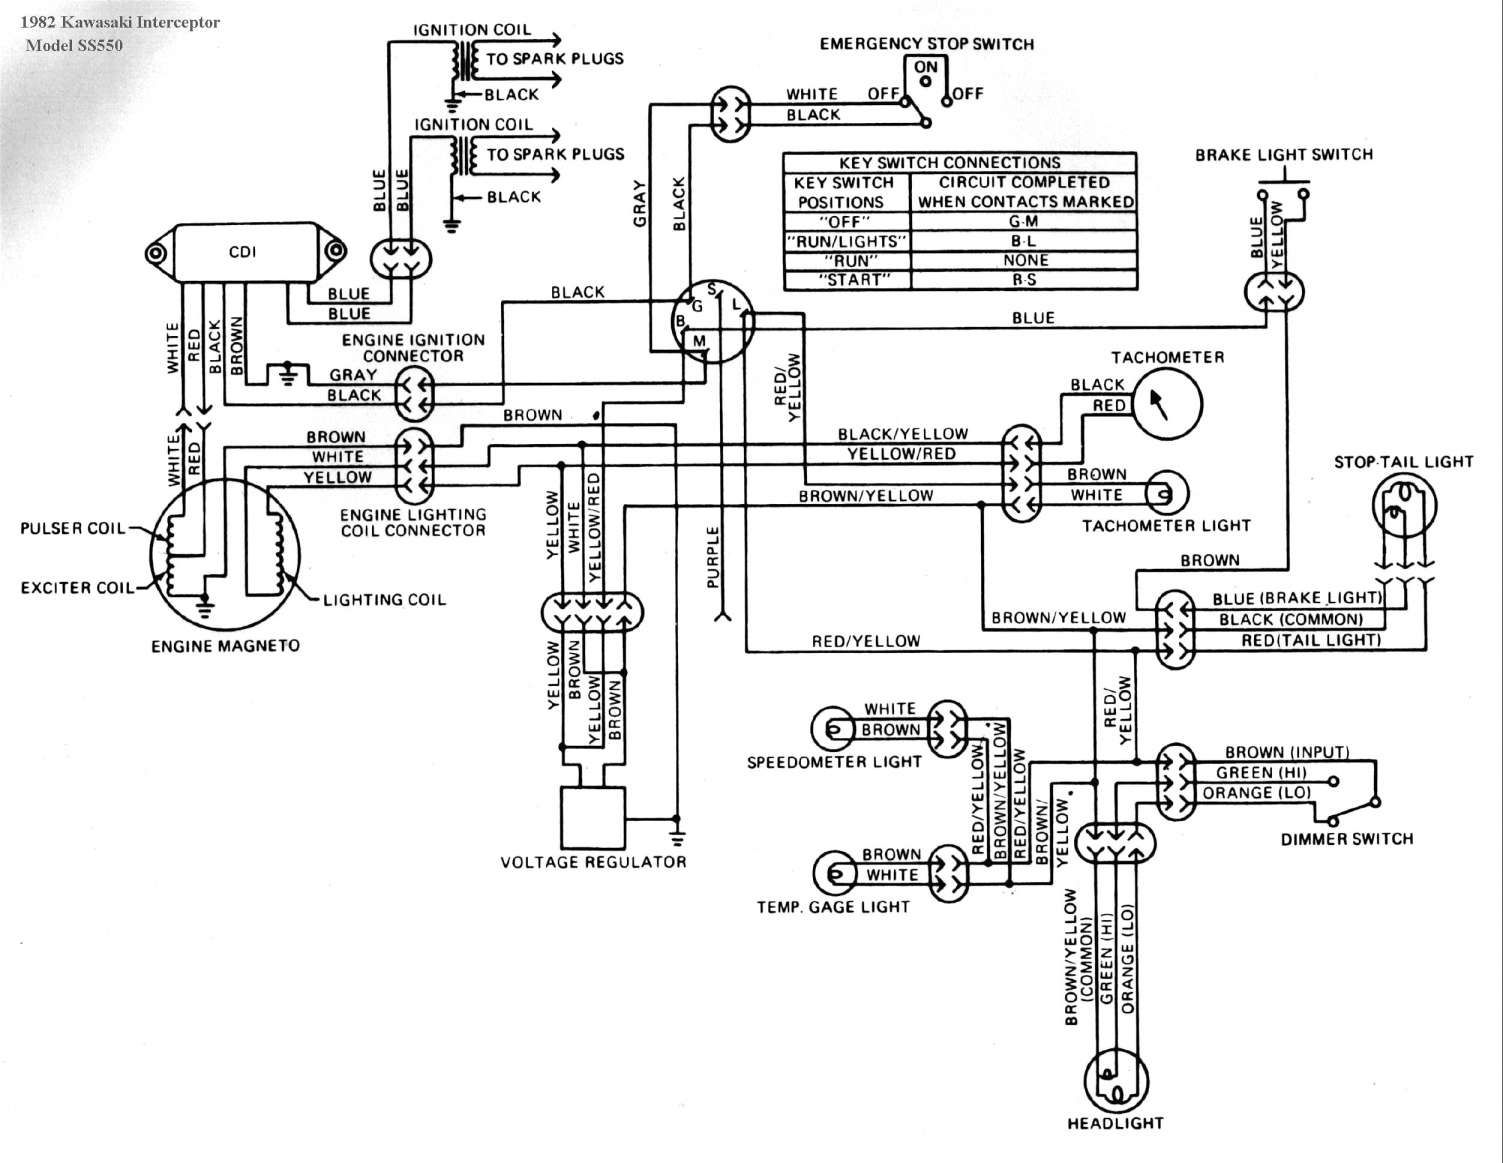 15 Hero Honda Splendor Engine Diagram Wiring Engine Diagram Wiringg Net In 2020 Diagram Jeep Engineering